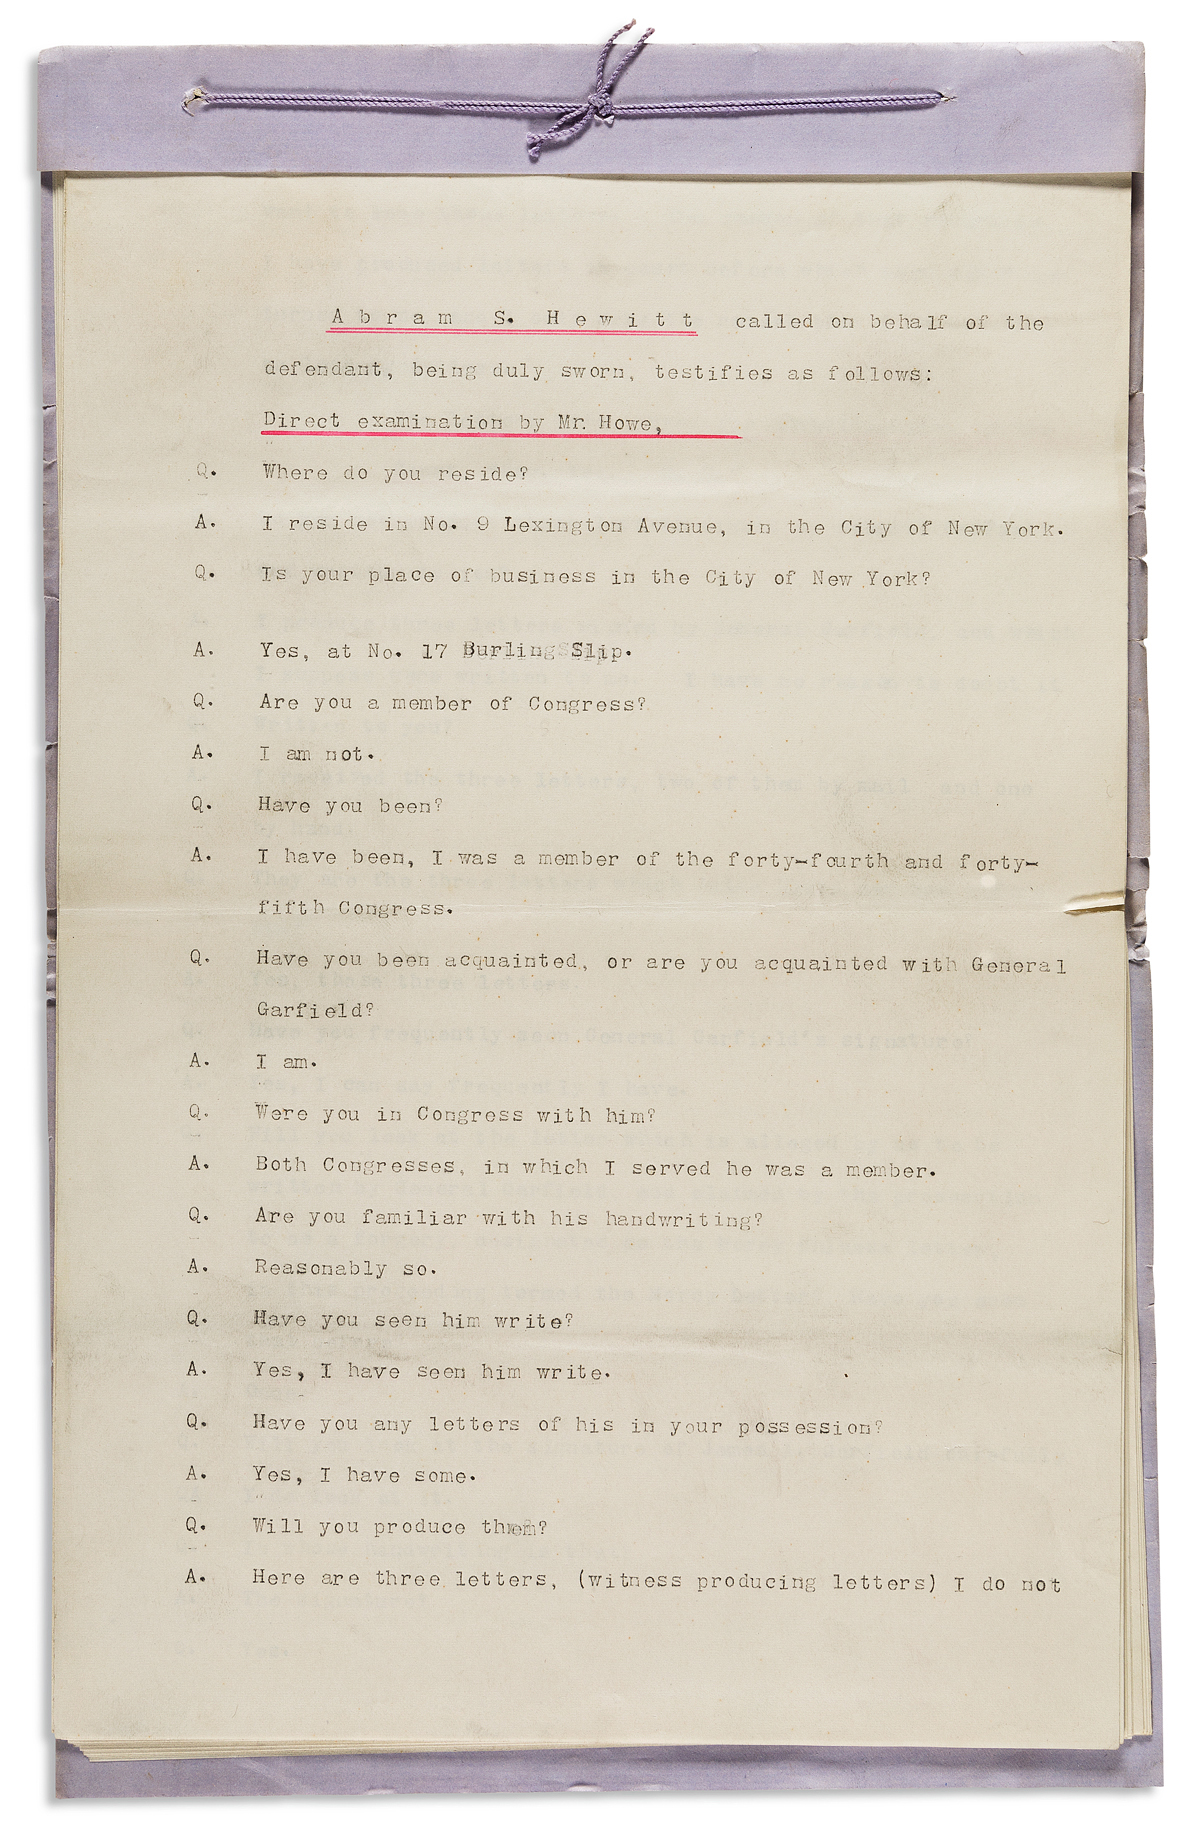 (NEW YORK CITY.) Papers of congressman and philanthropist Abram S. Hewitt.